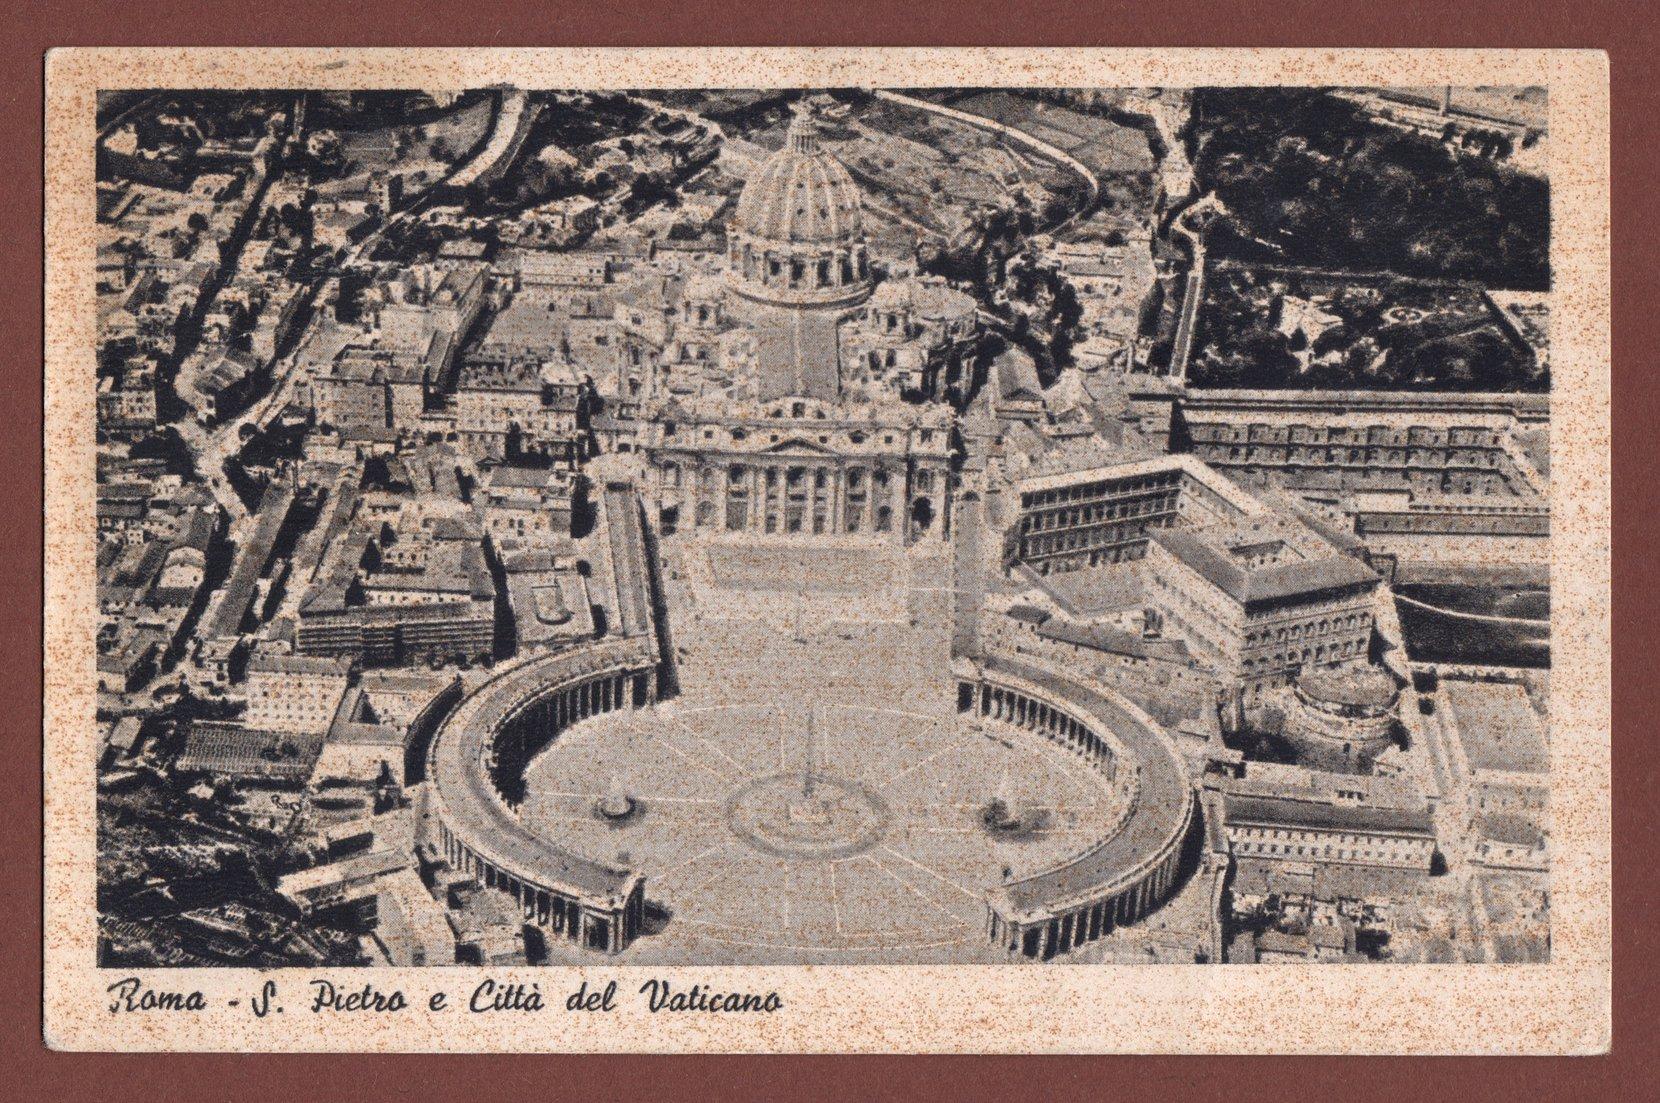 roma, piazza san pietro, cittá del vaticano (1939) postcards vintage – real photo (rppc)